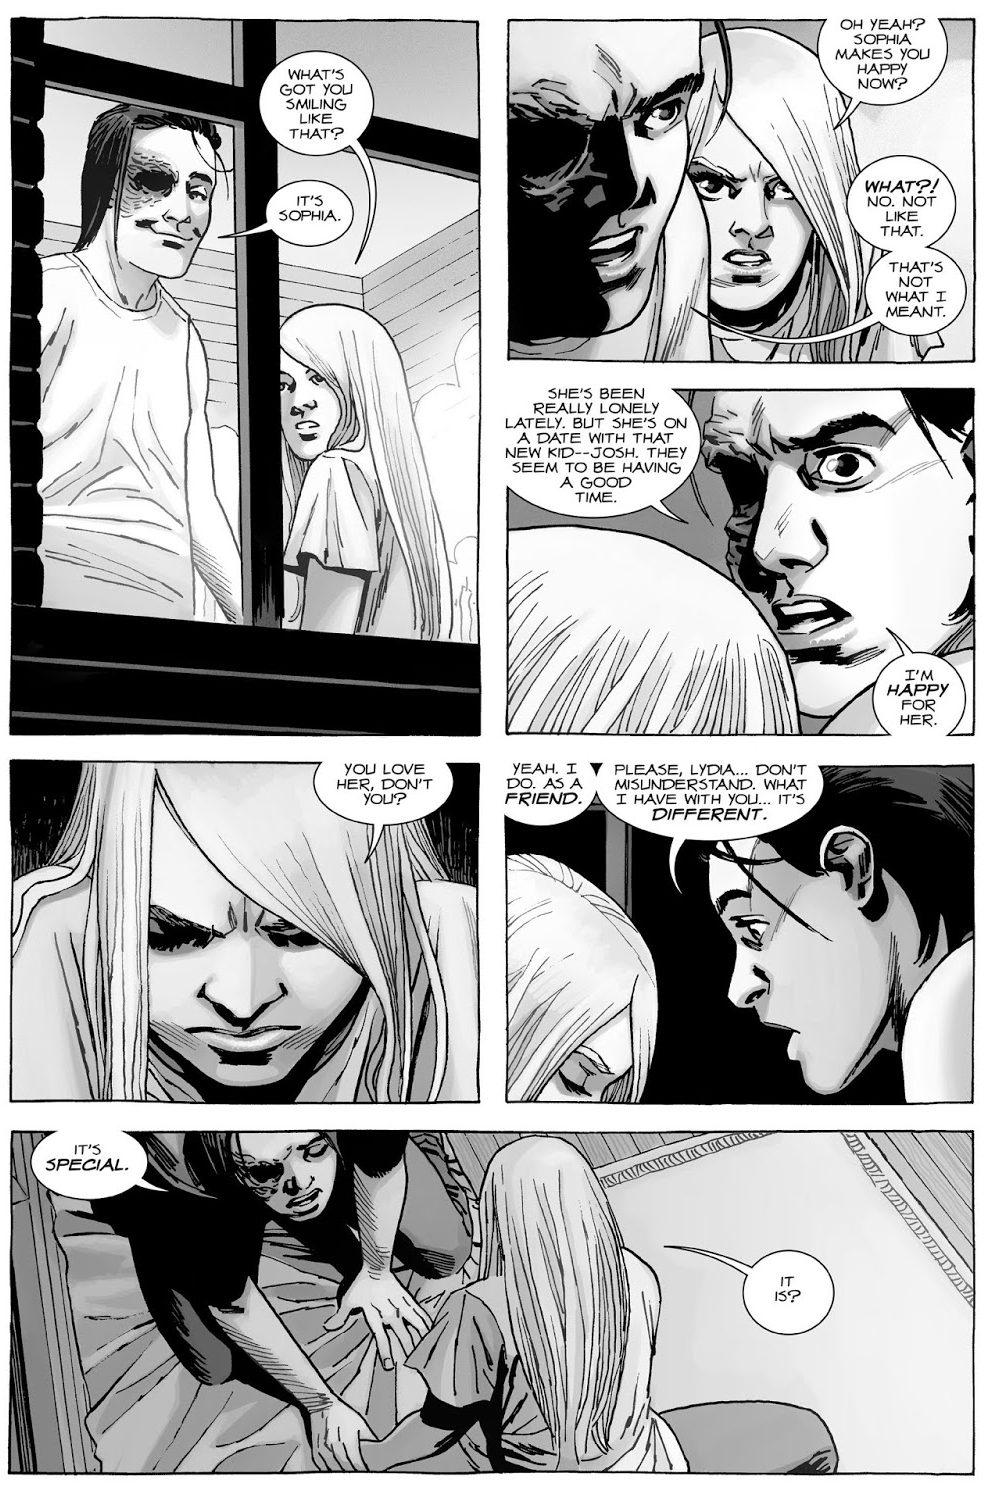 From – The Walking Dead #187